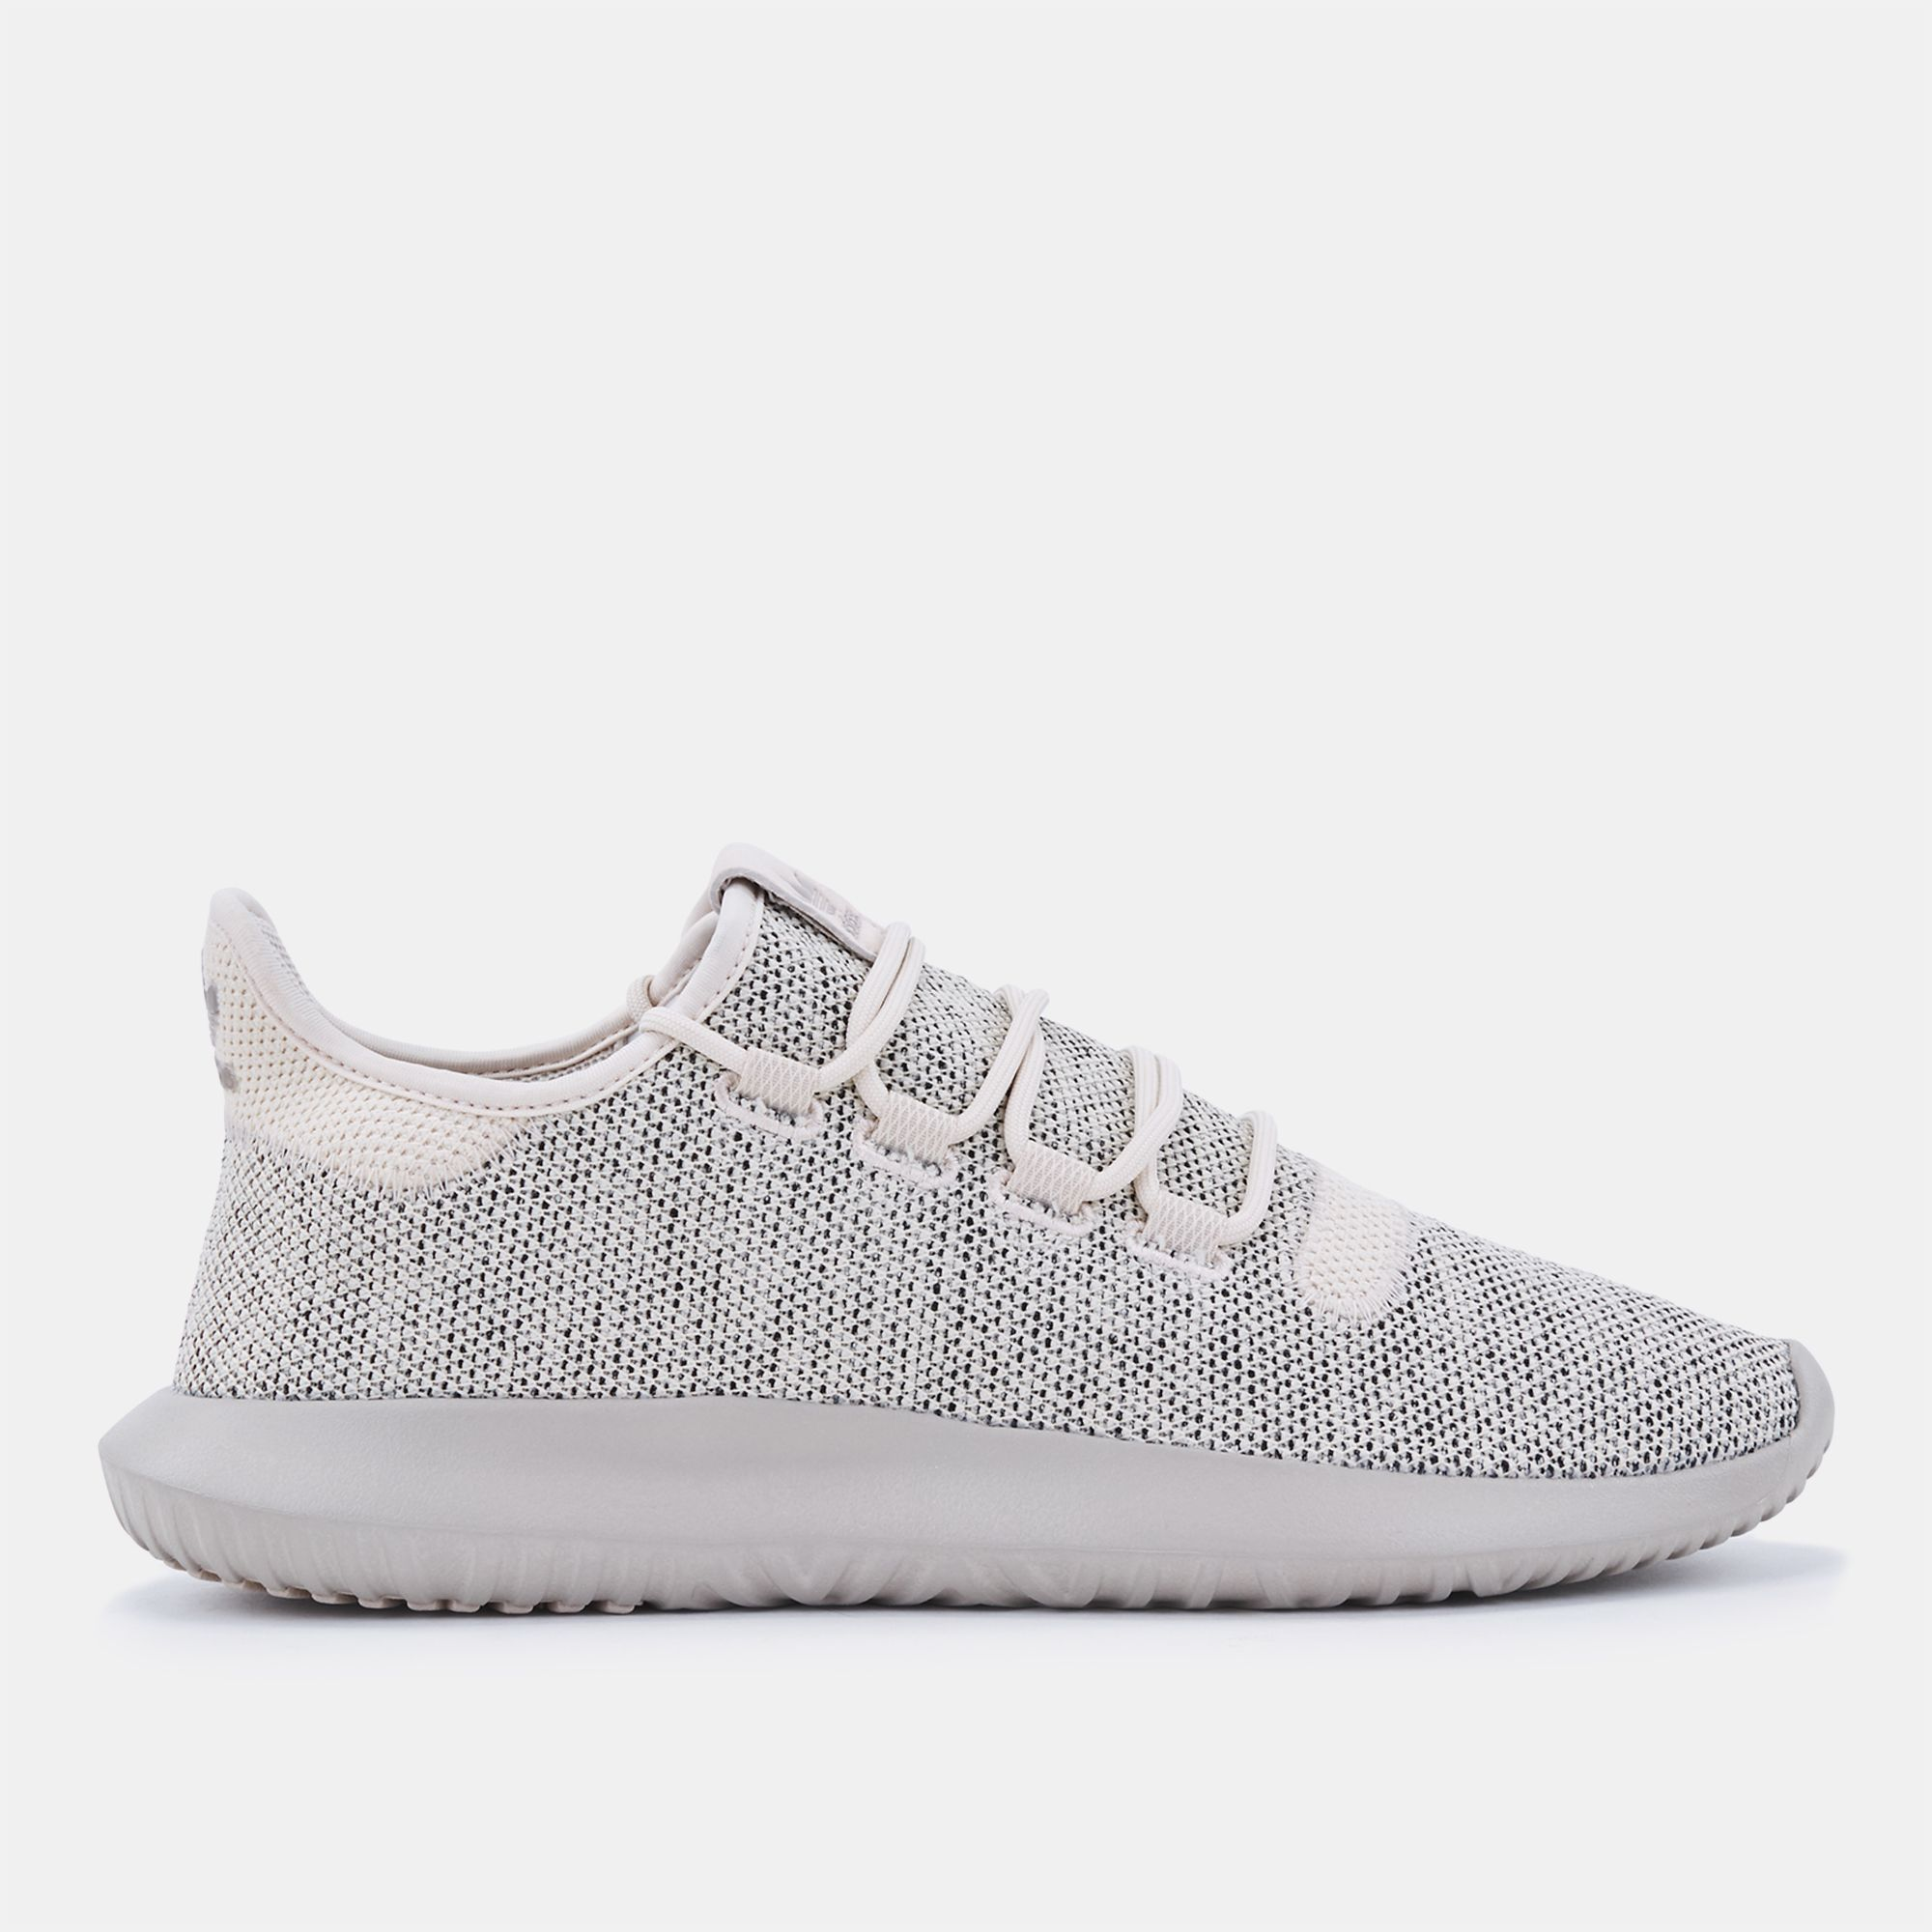 940ea51161ad9e adidas Originals Tubular Shadow Knit Shoe